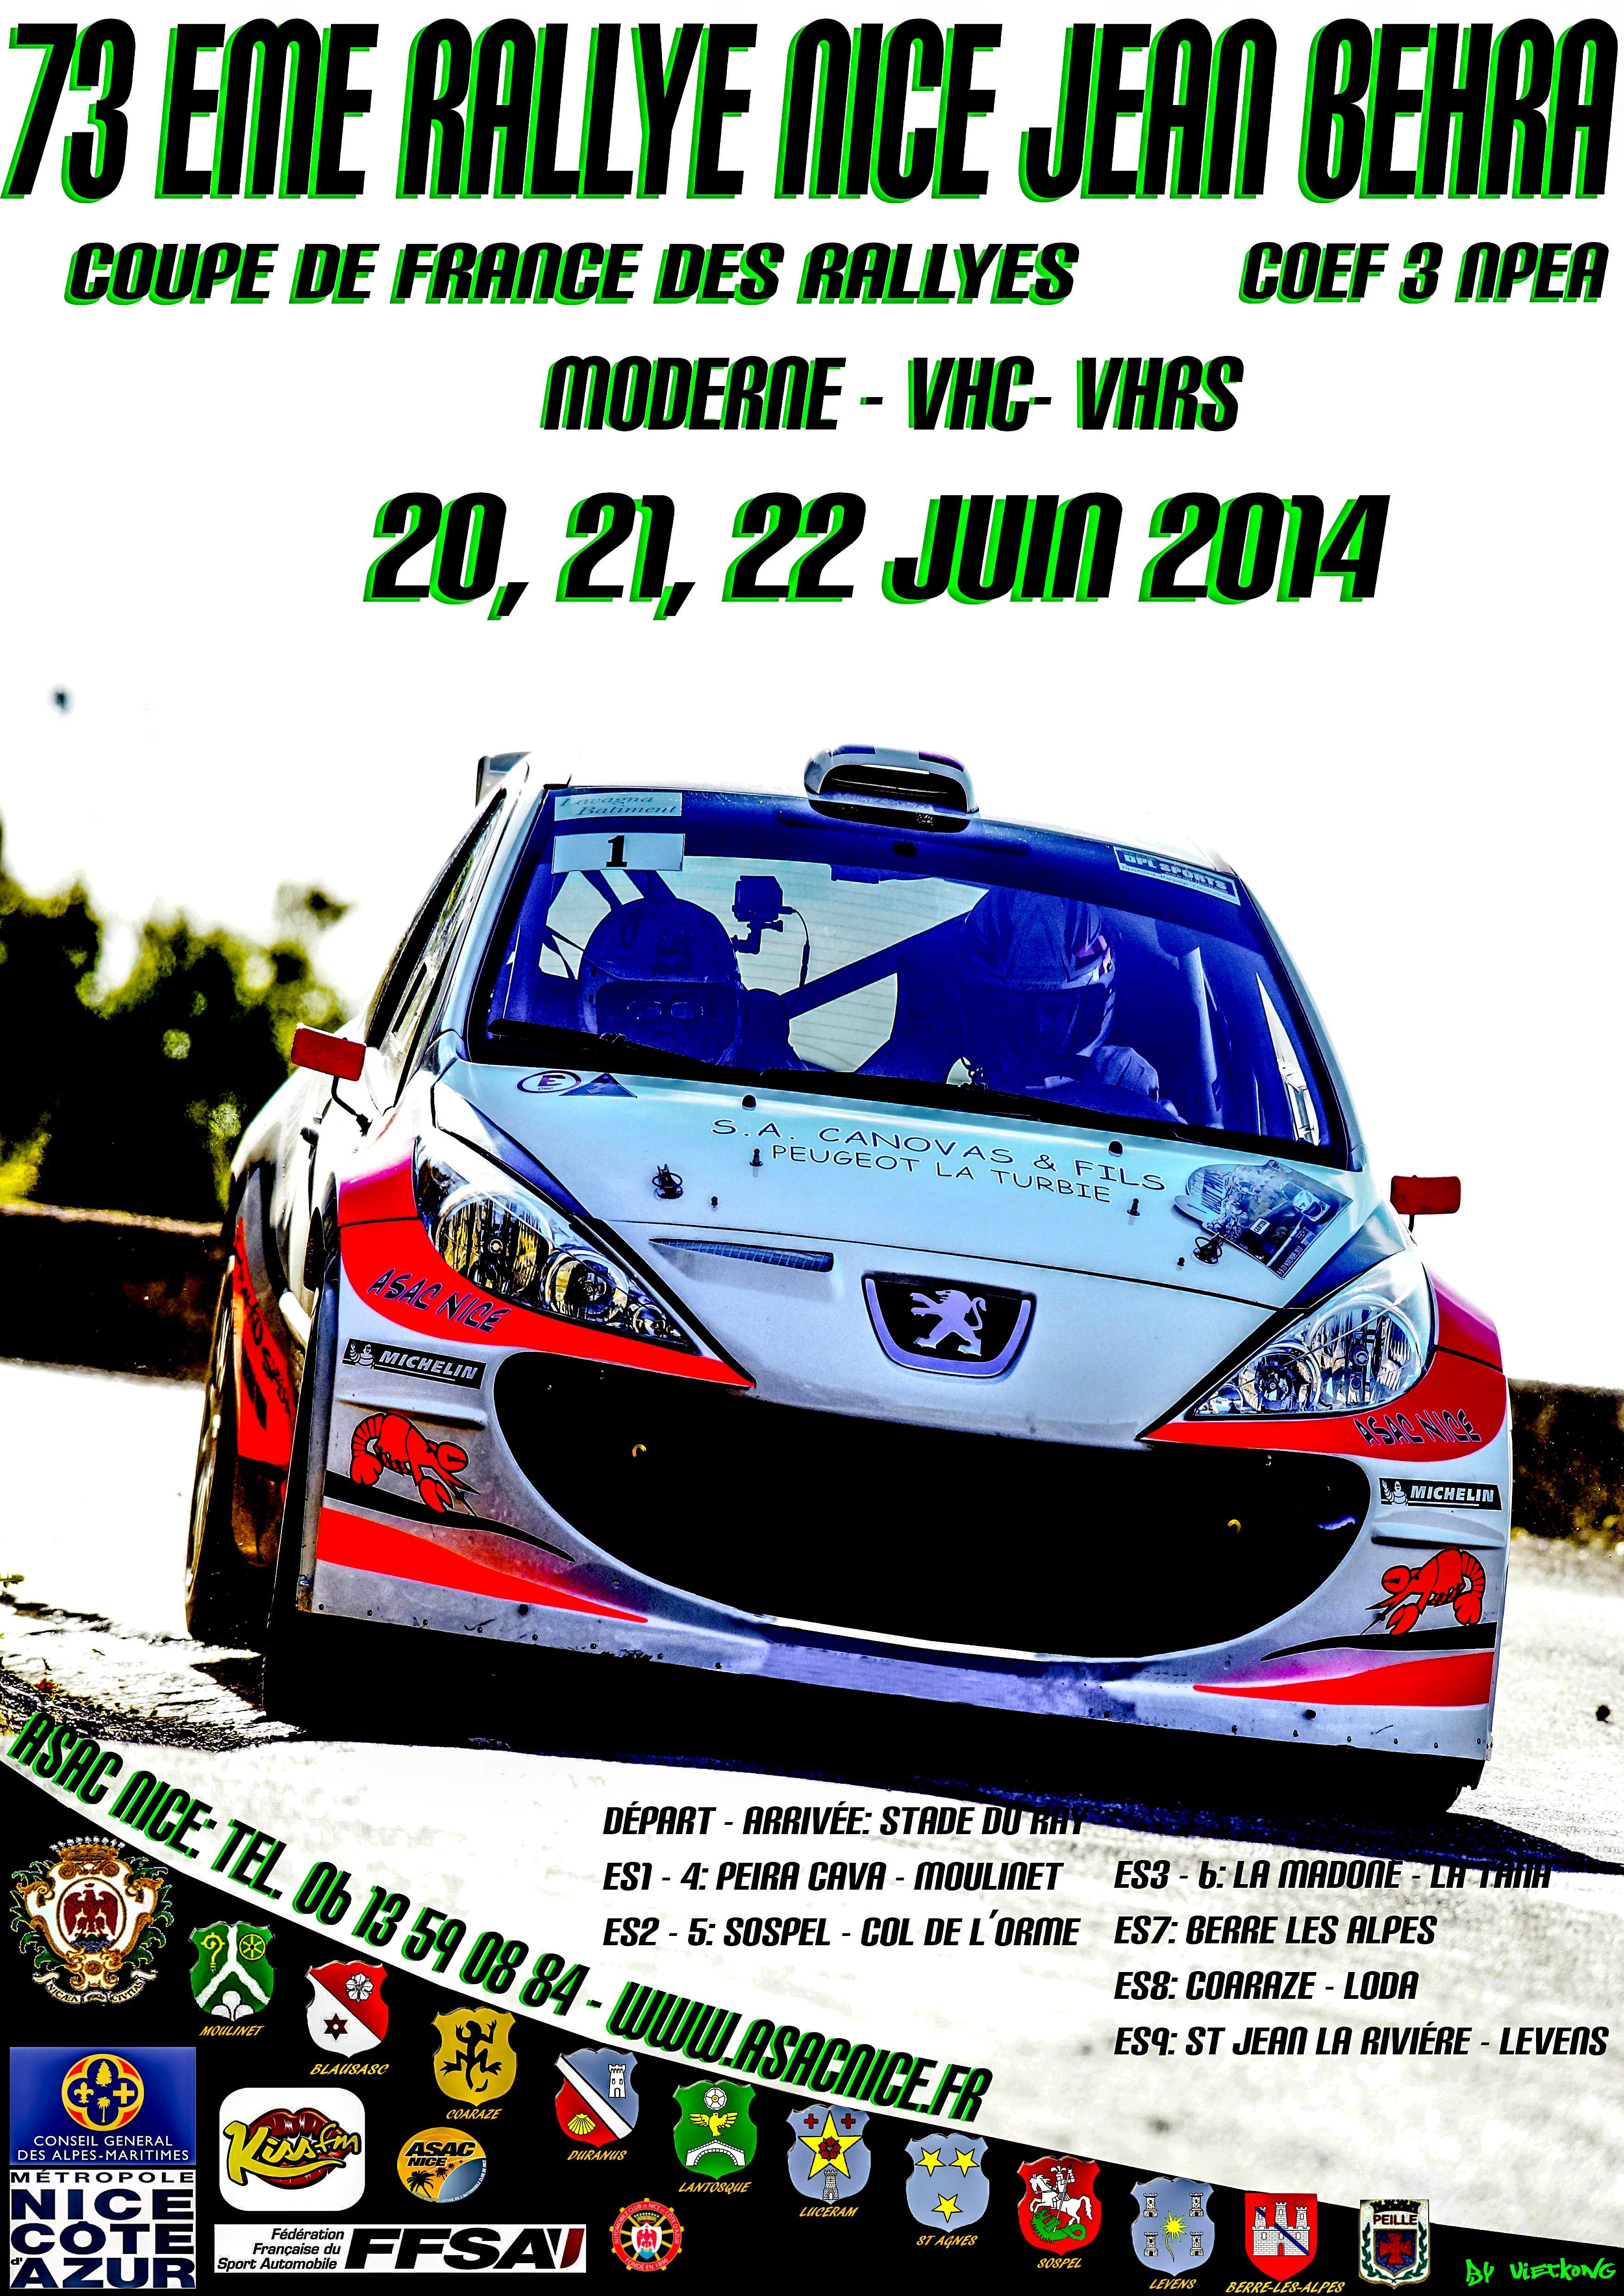 Rallye-de-Jean-Behra-2014